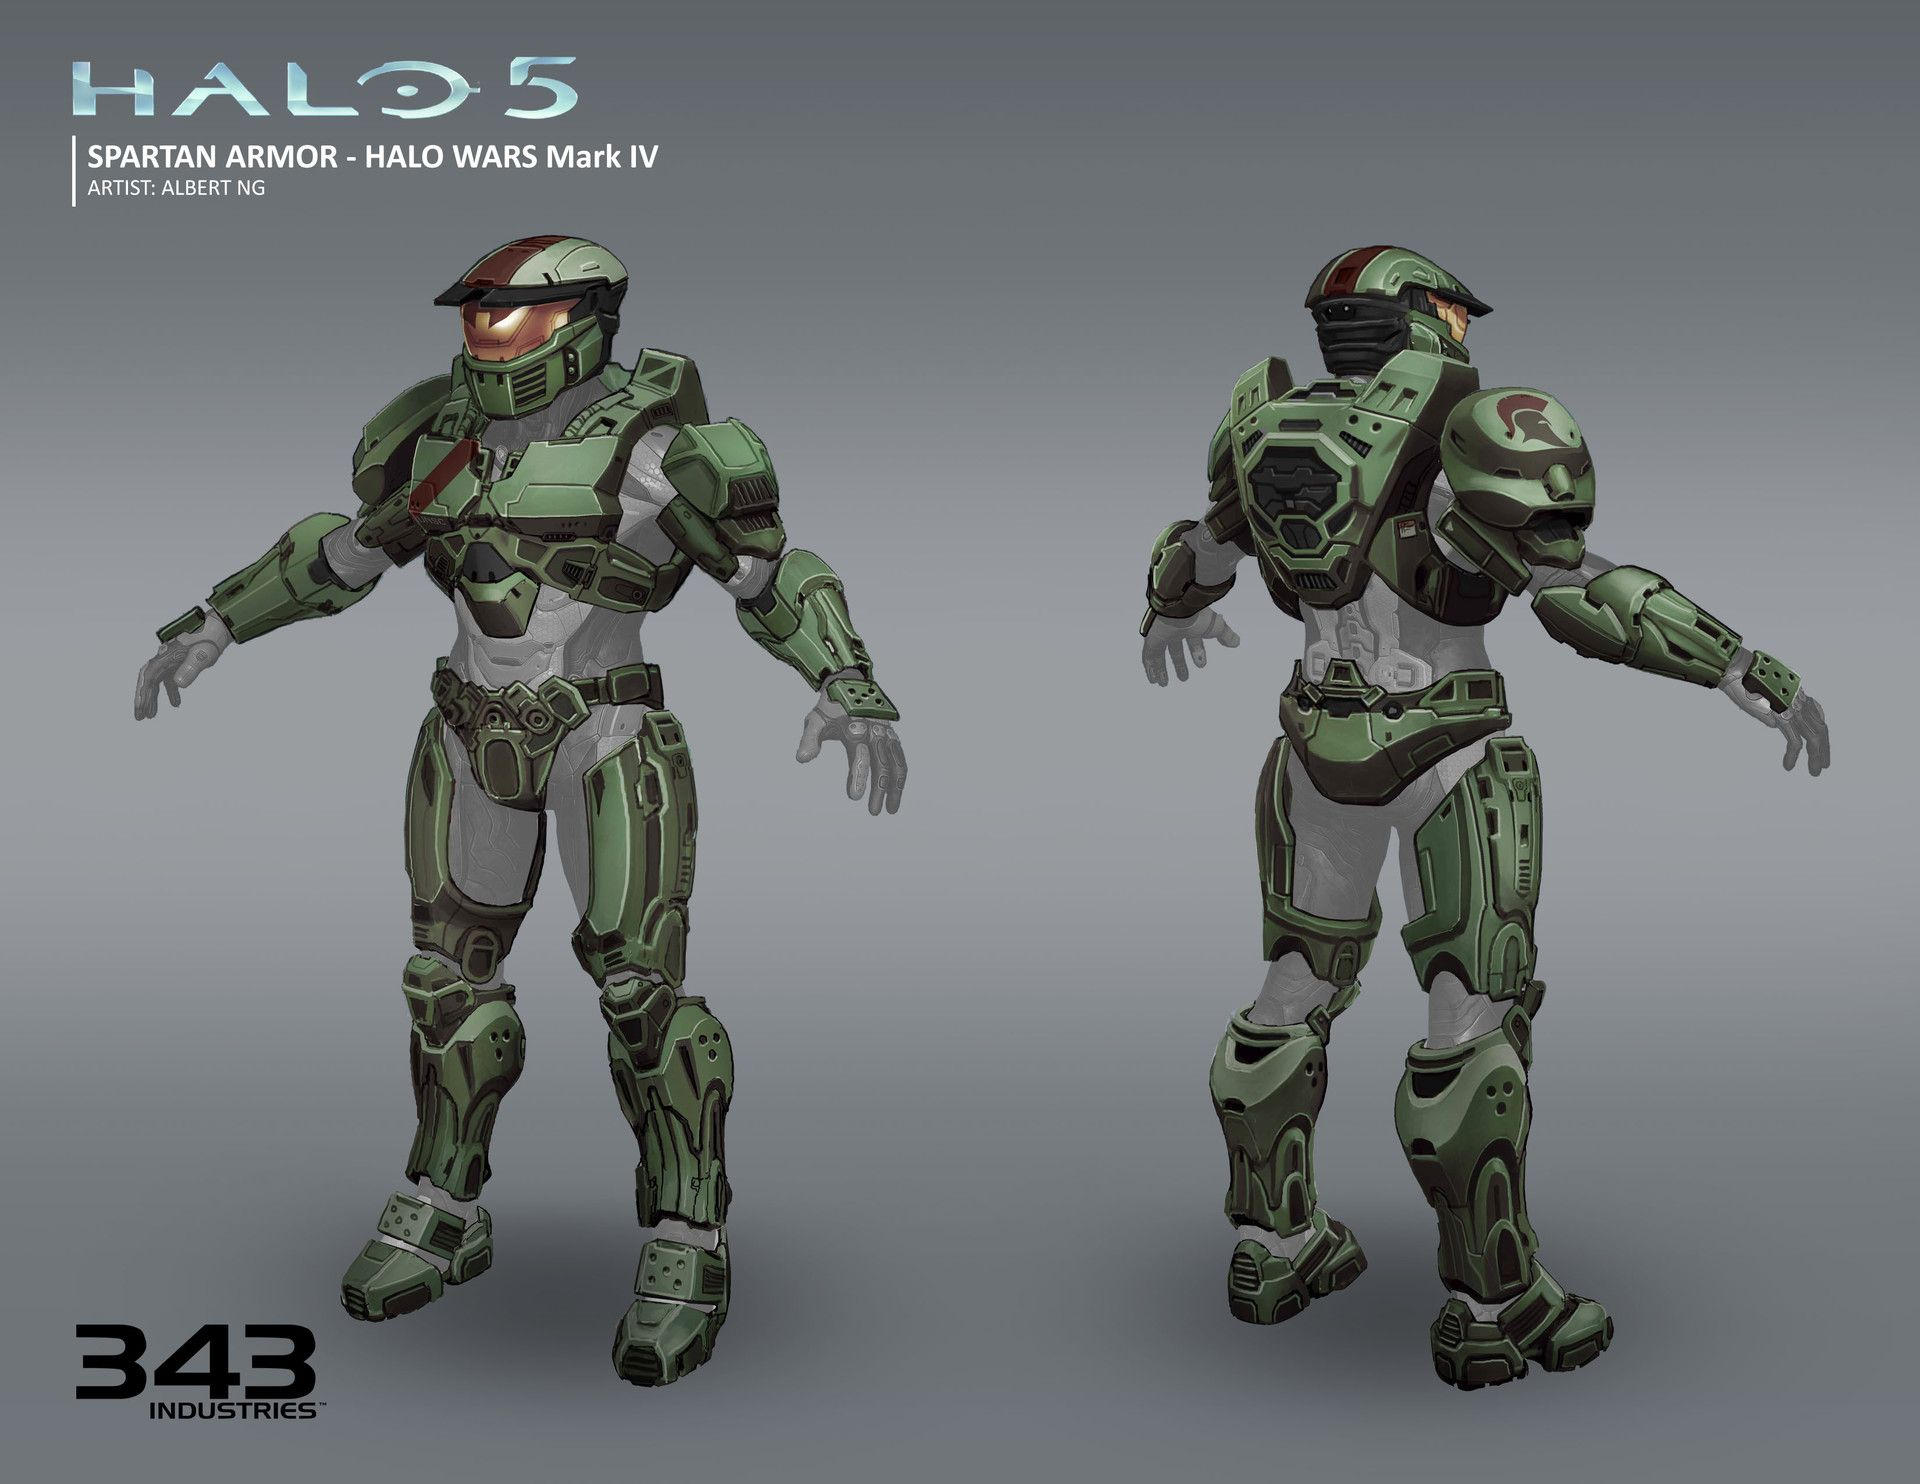 ArtStation - Halo 5 Armors, Albert Ng | Halo | Halo 5 armor, Halo